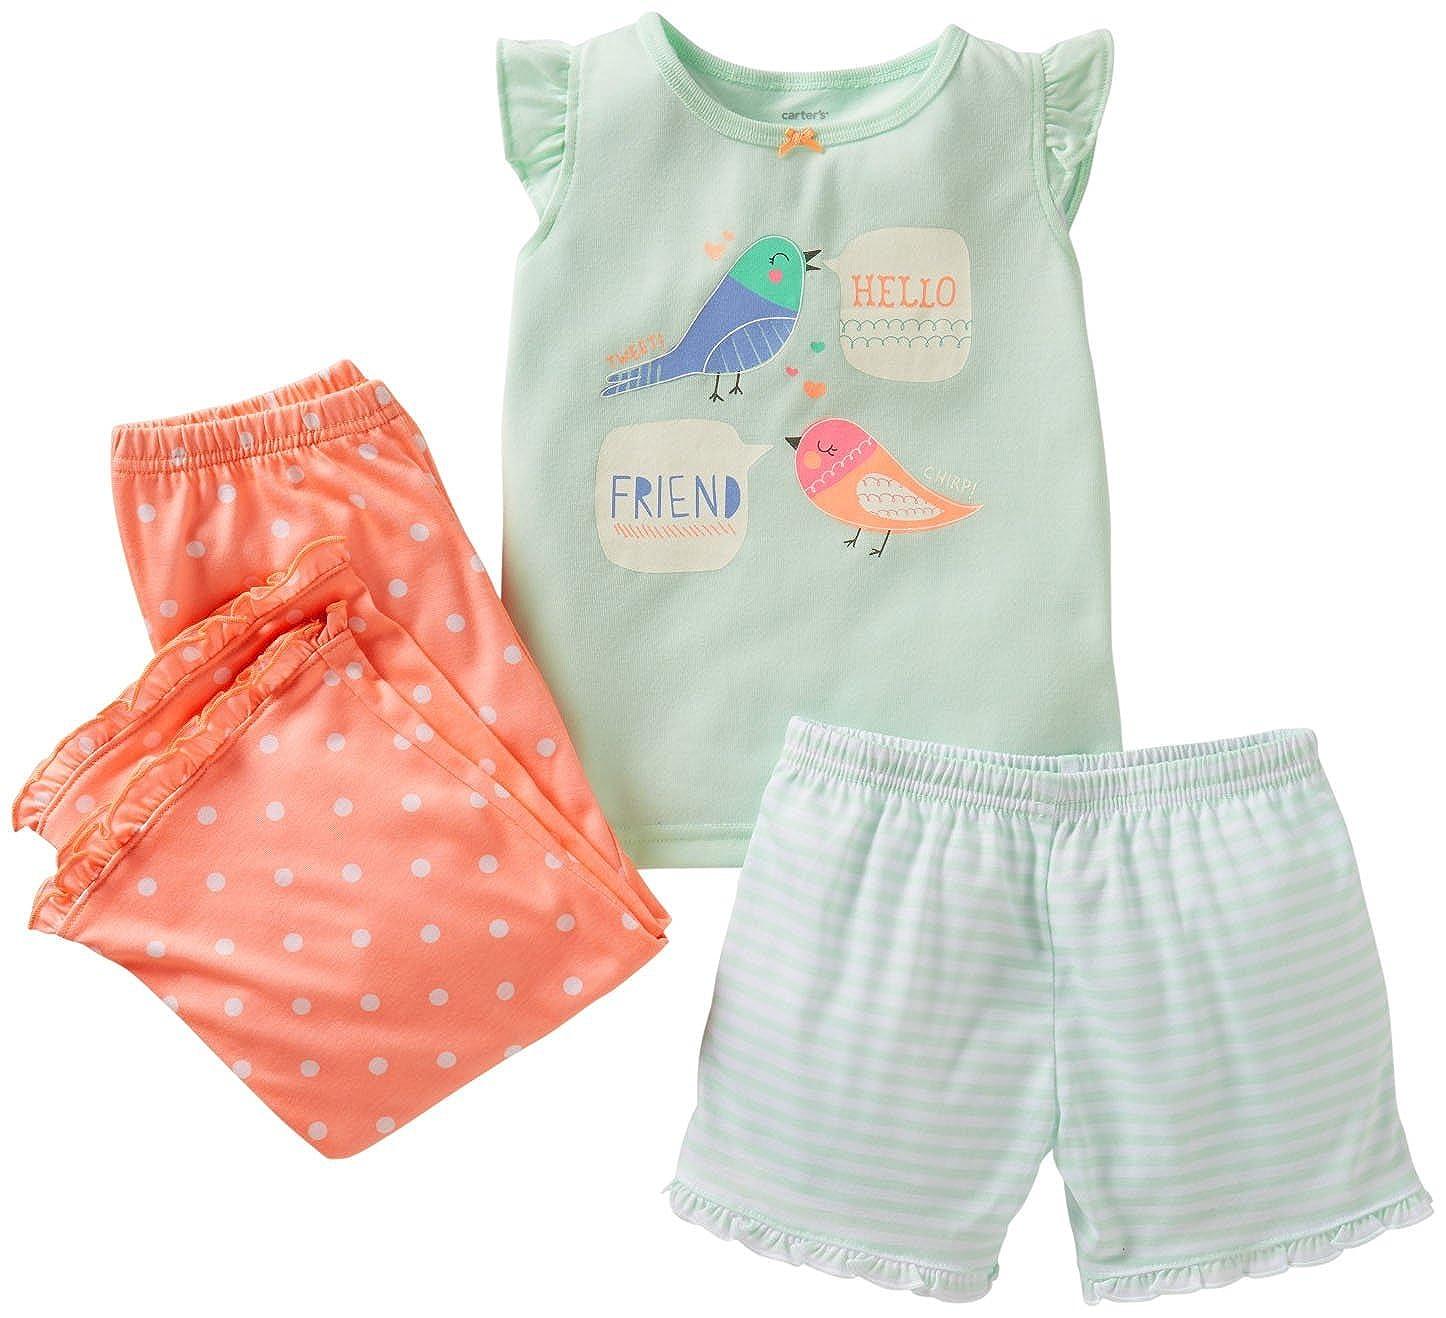 【予約販売品】 Carter's SLEEPWEAR Mint ベビーガールズ 24 24 SLEEPWEAR Months Mint Birds B00I0LEJ6C, Jos Brand Select Shop:d64cadb6 --- a0267596.xsph.ru